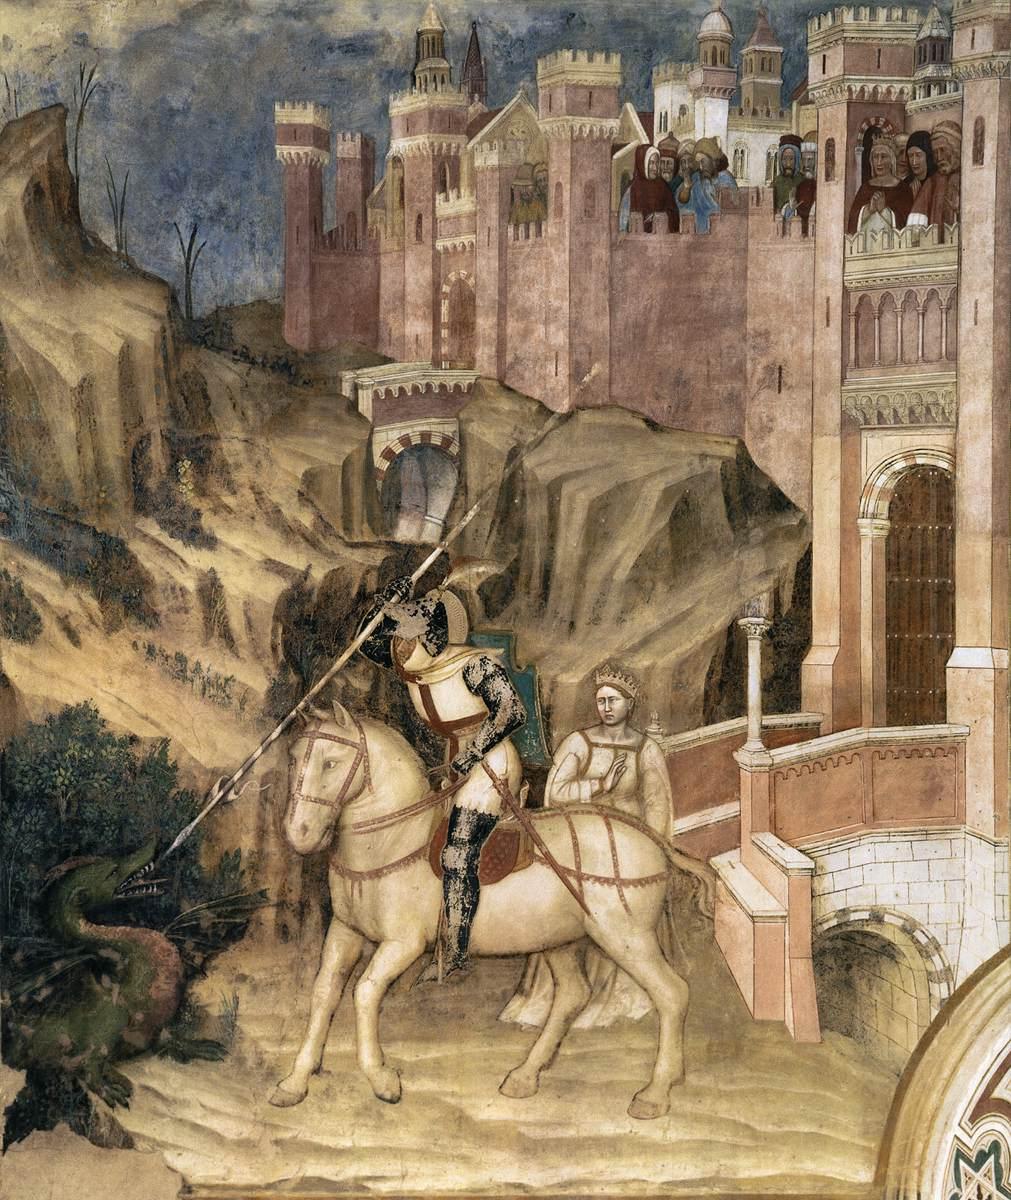 Altichiero da Zevio St Joris doodt de draak Oratorio di San Giorgio, Padua